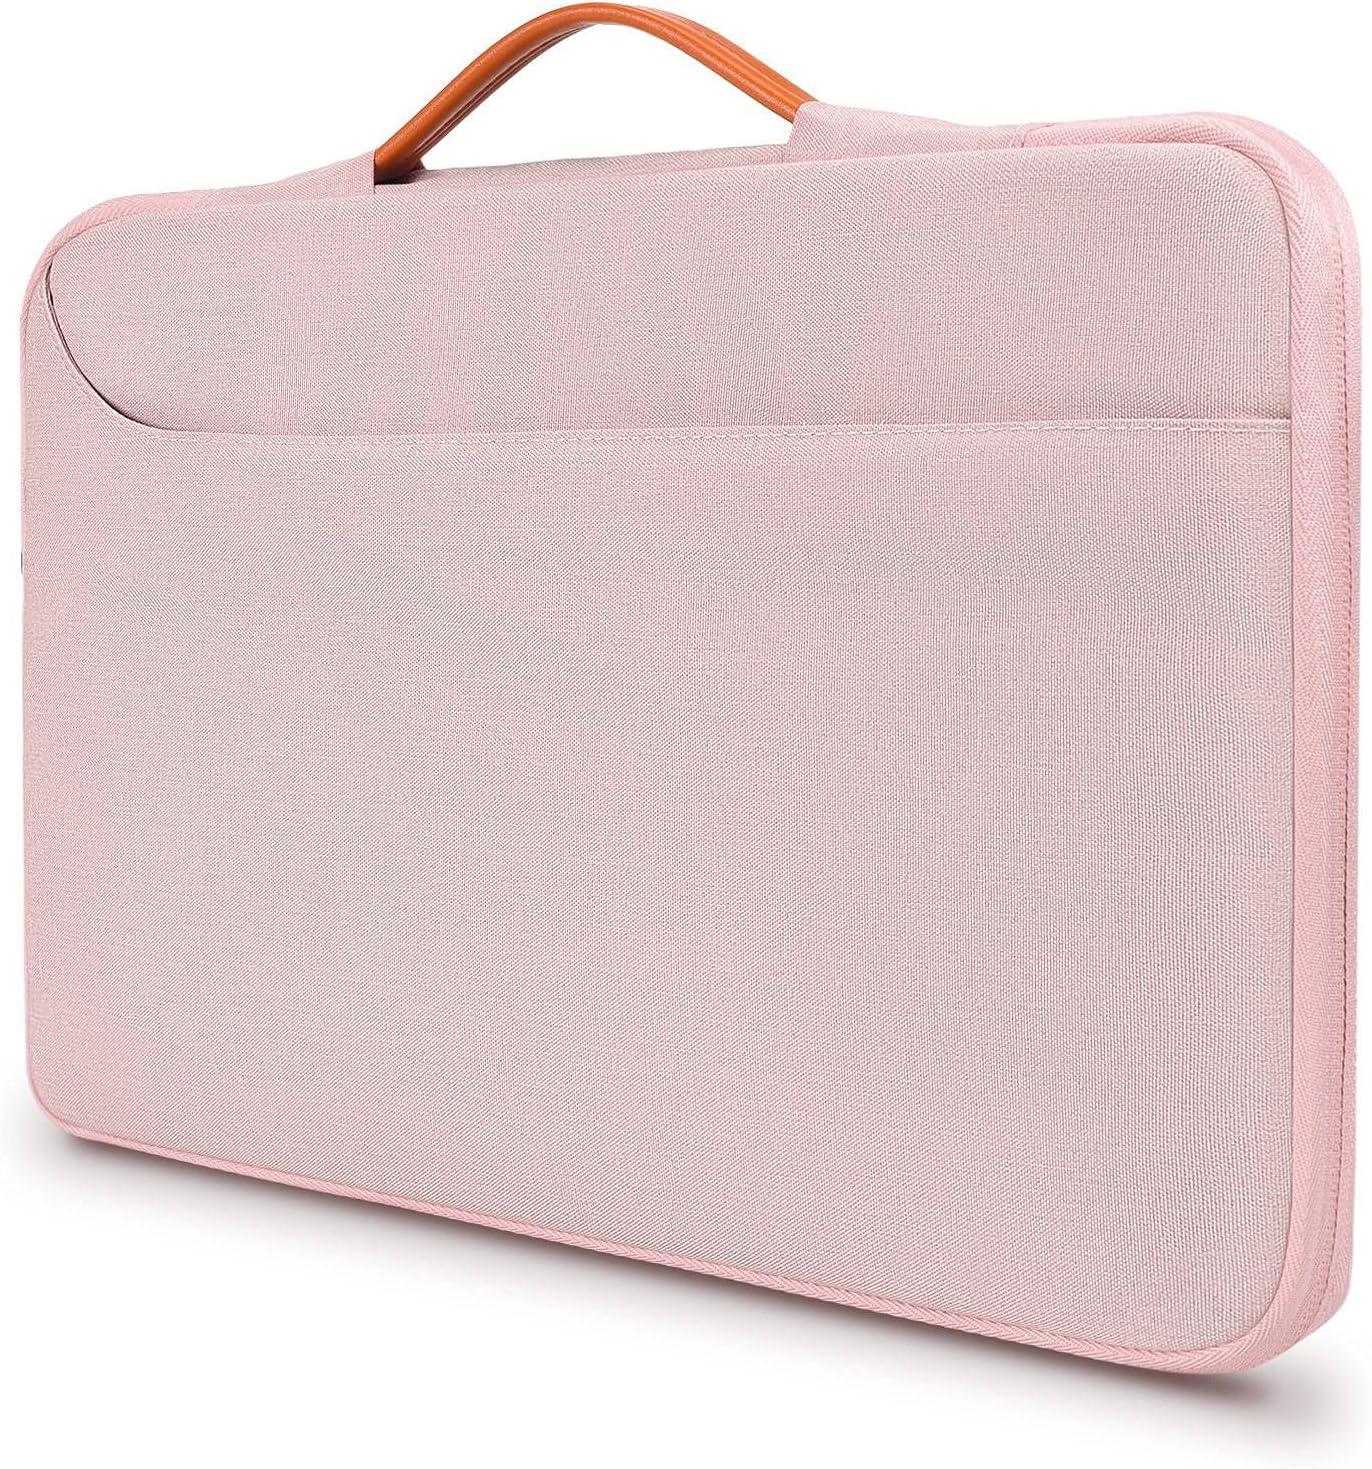 Laptop Case for Women, 12-13.5 inch Laptop Briefcase Spill-Resistant Computer Bag for DELL XPS 13 9310, Surface Laptop 13.5, 12-13.5